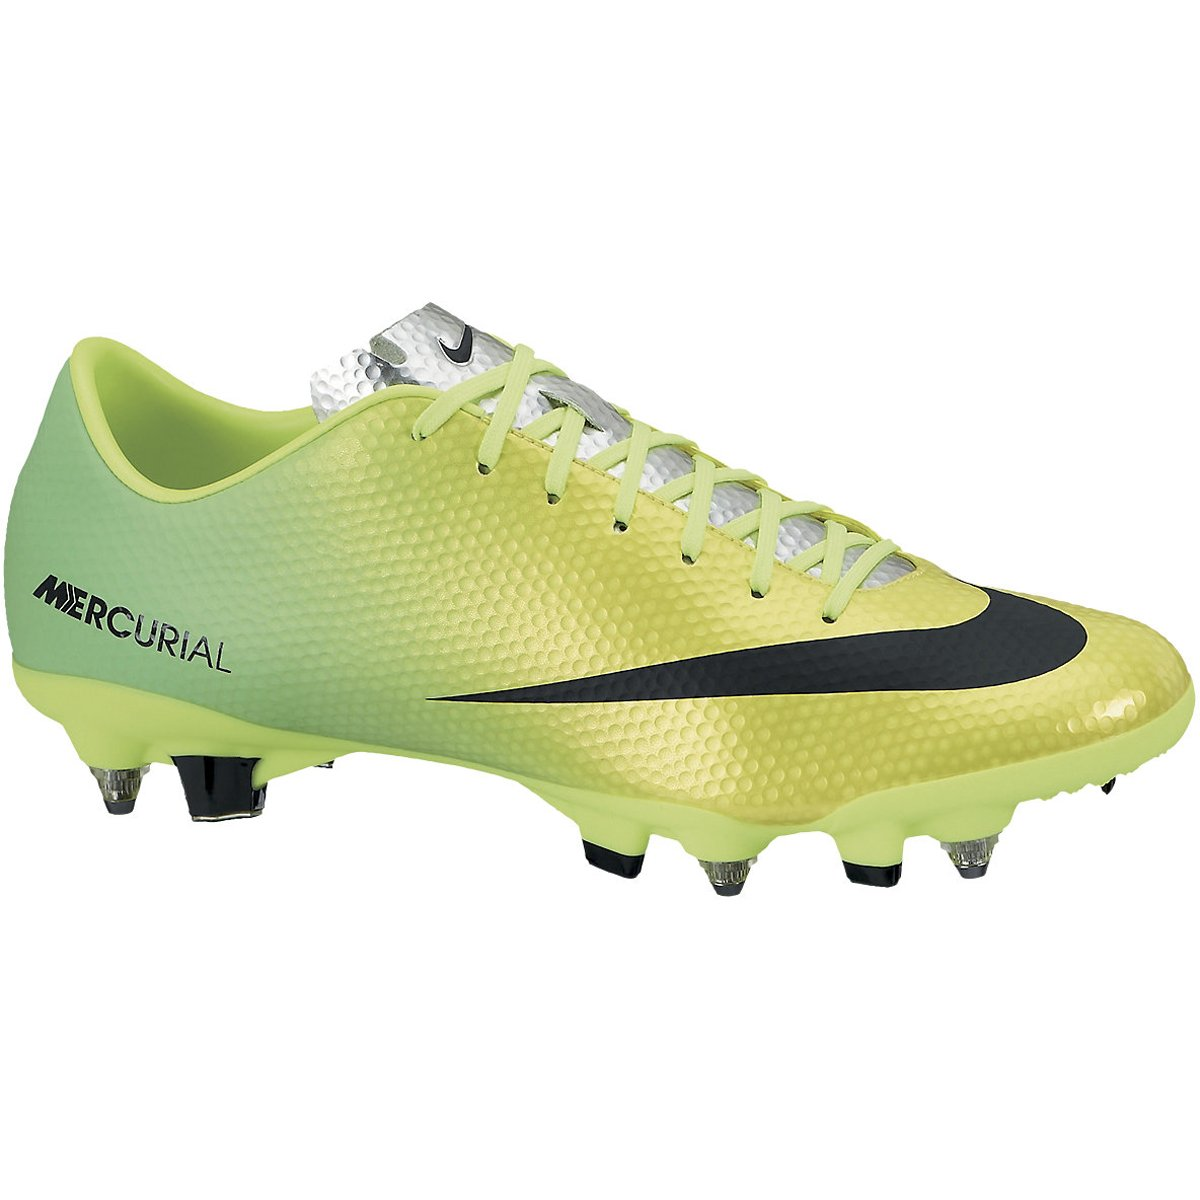 Chuteira Nike Mercurial Veloce SG Pro - Compre Agora  58cde6ff331eb